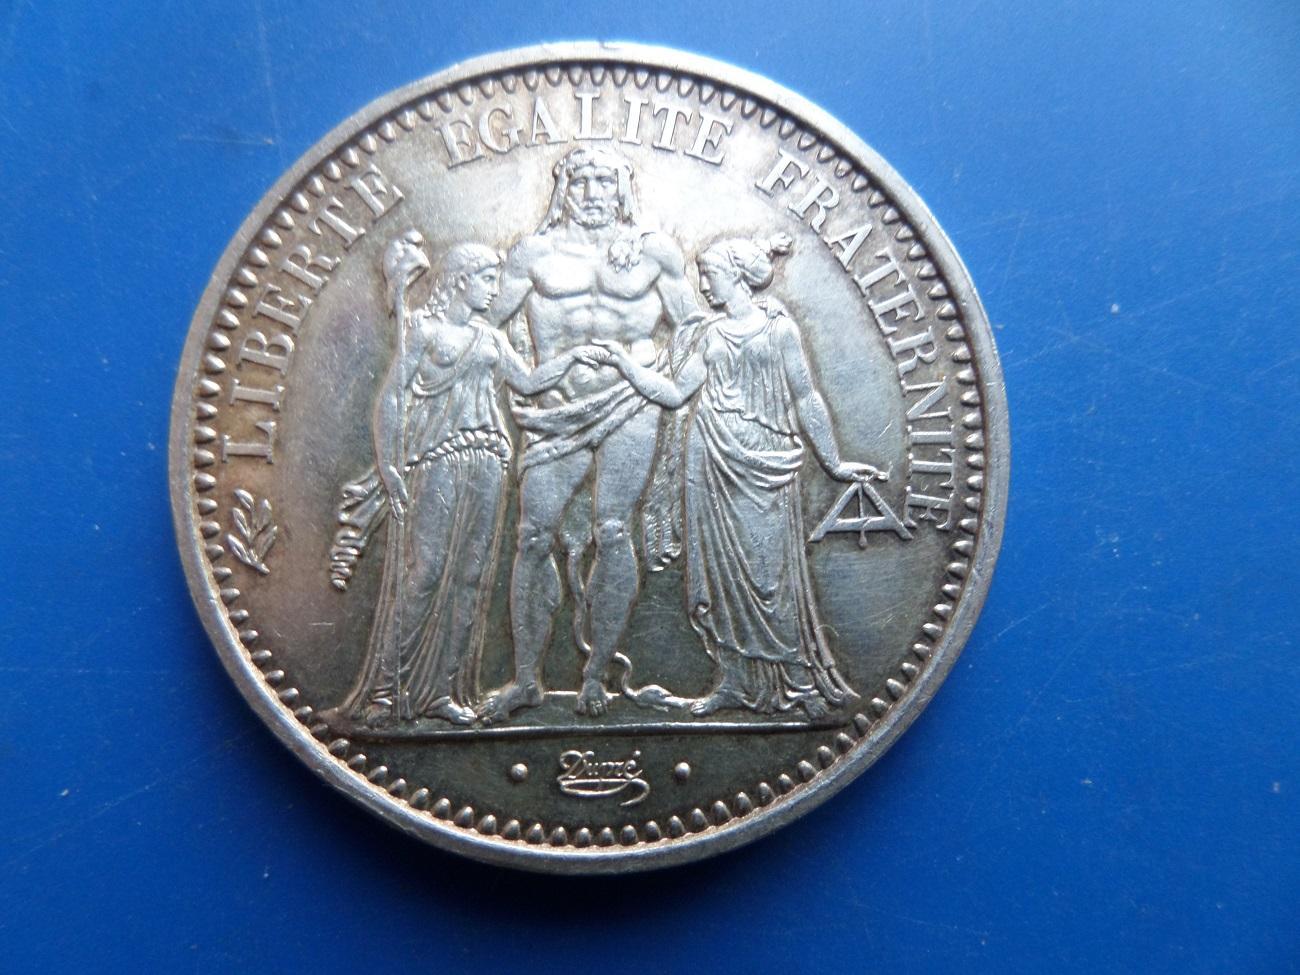 10 fr argent 1968 2